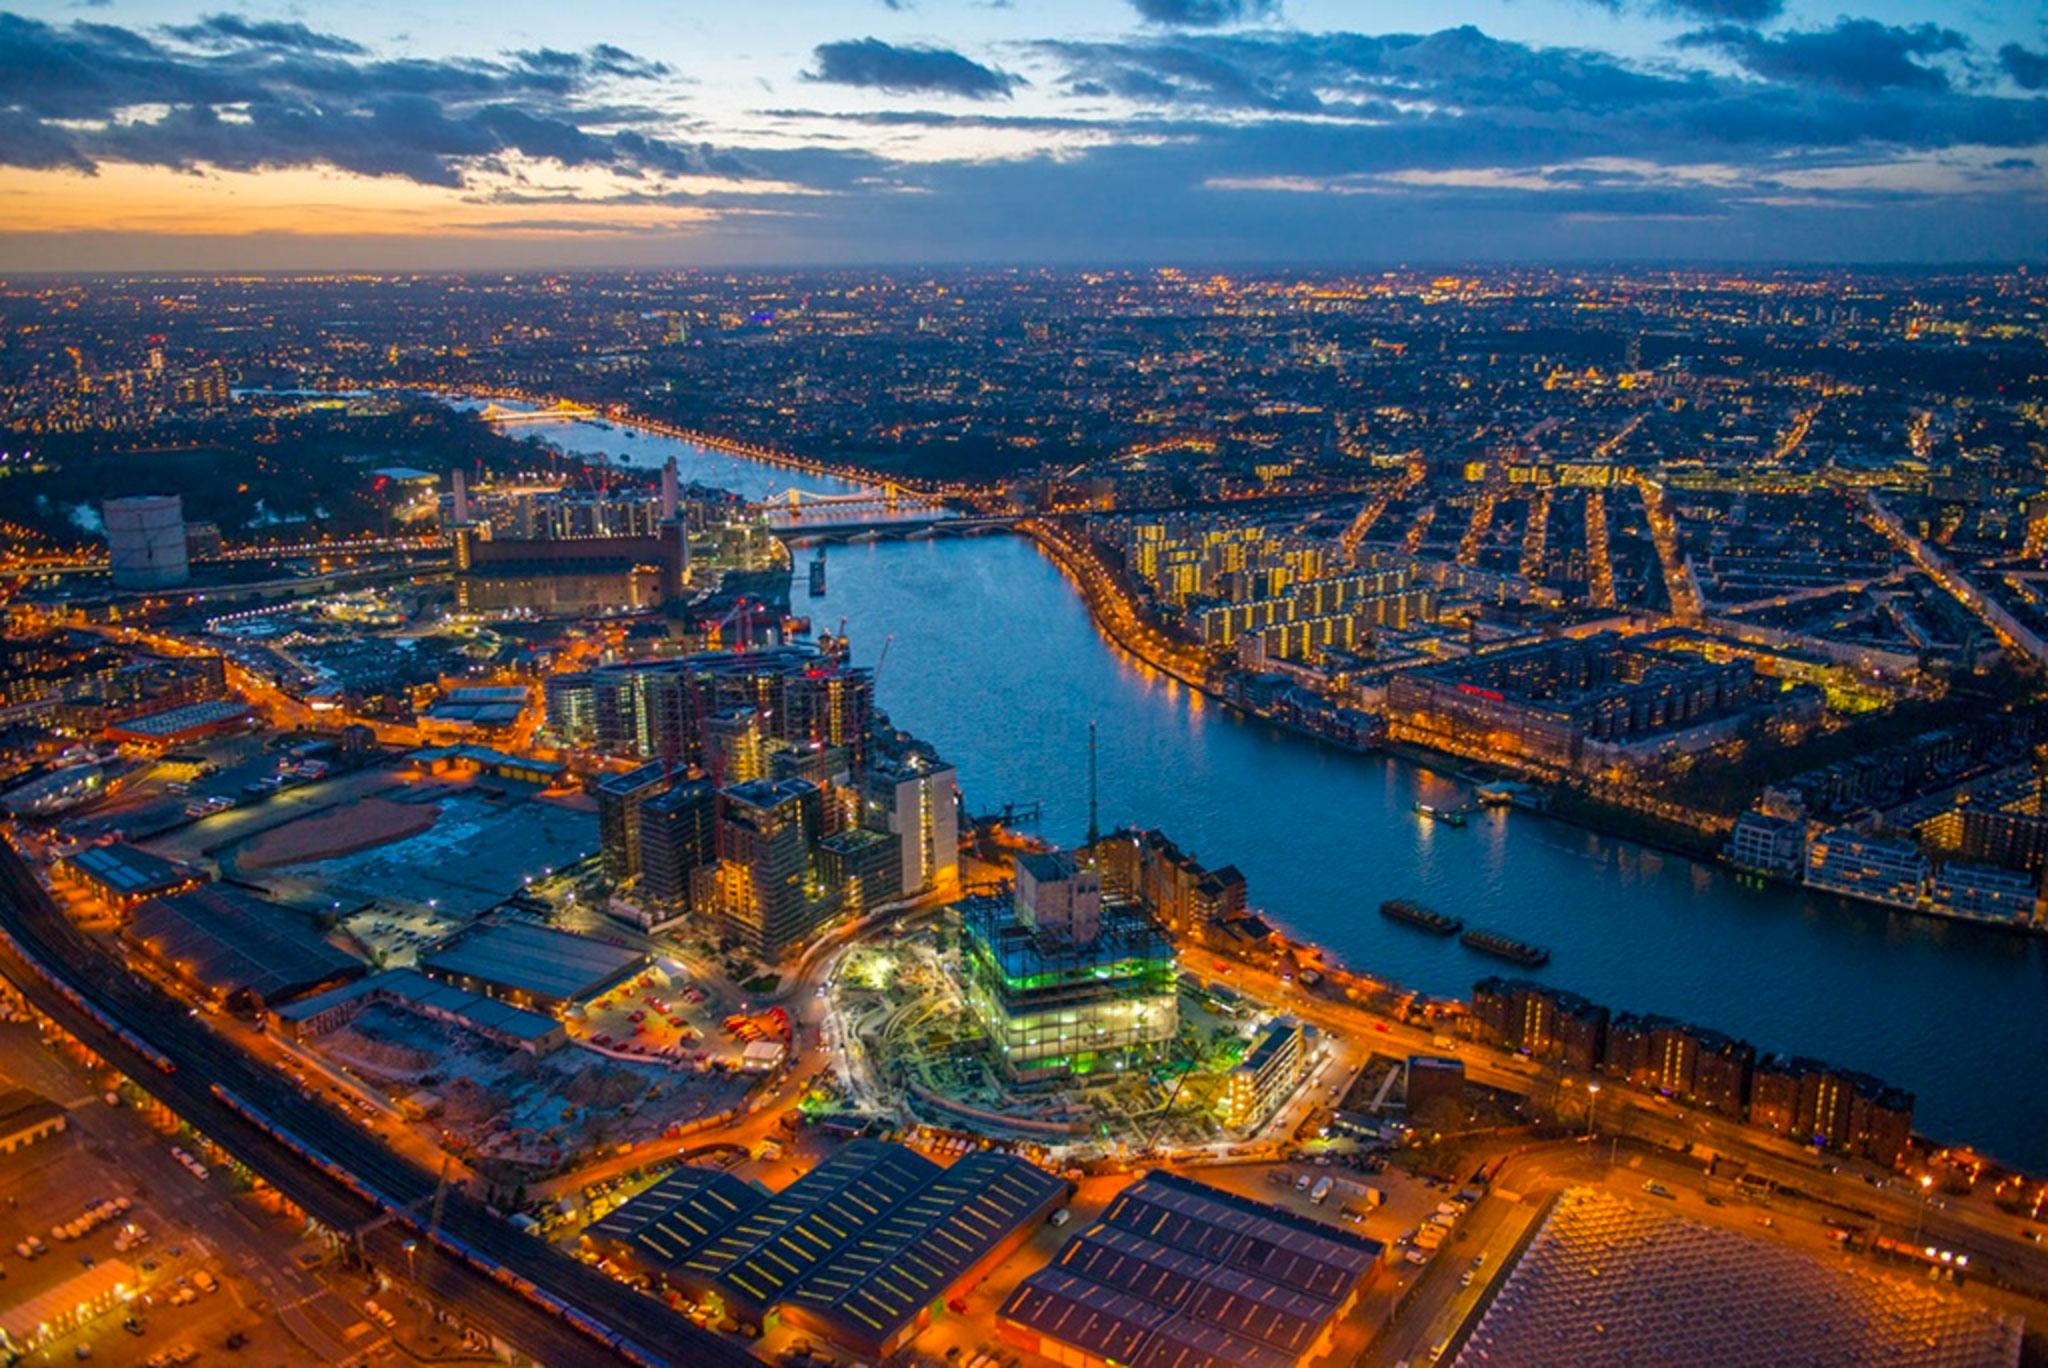 Jason-Hawkes_Battersea_Power-Station_night